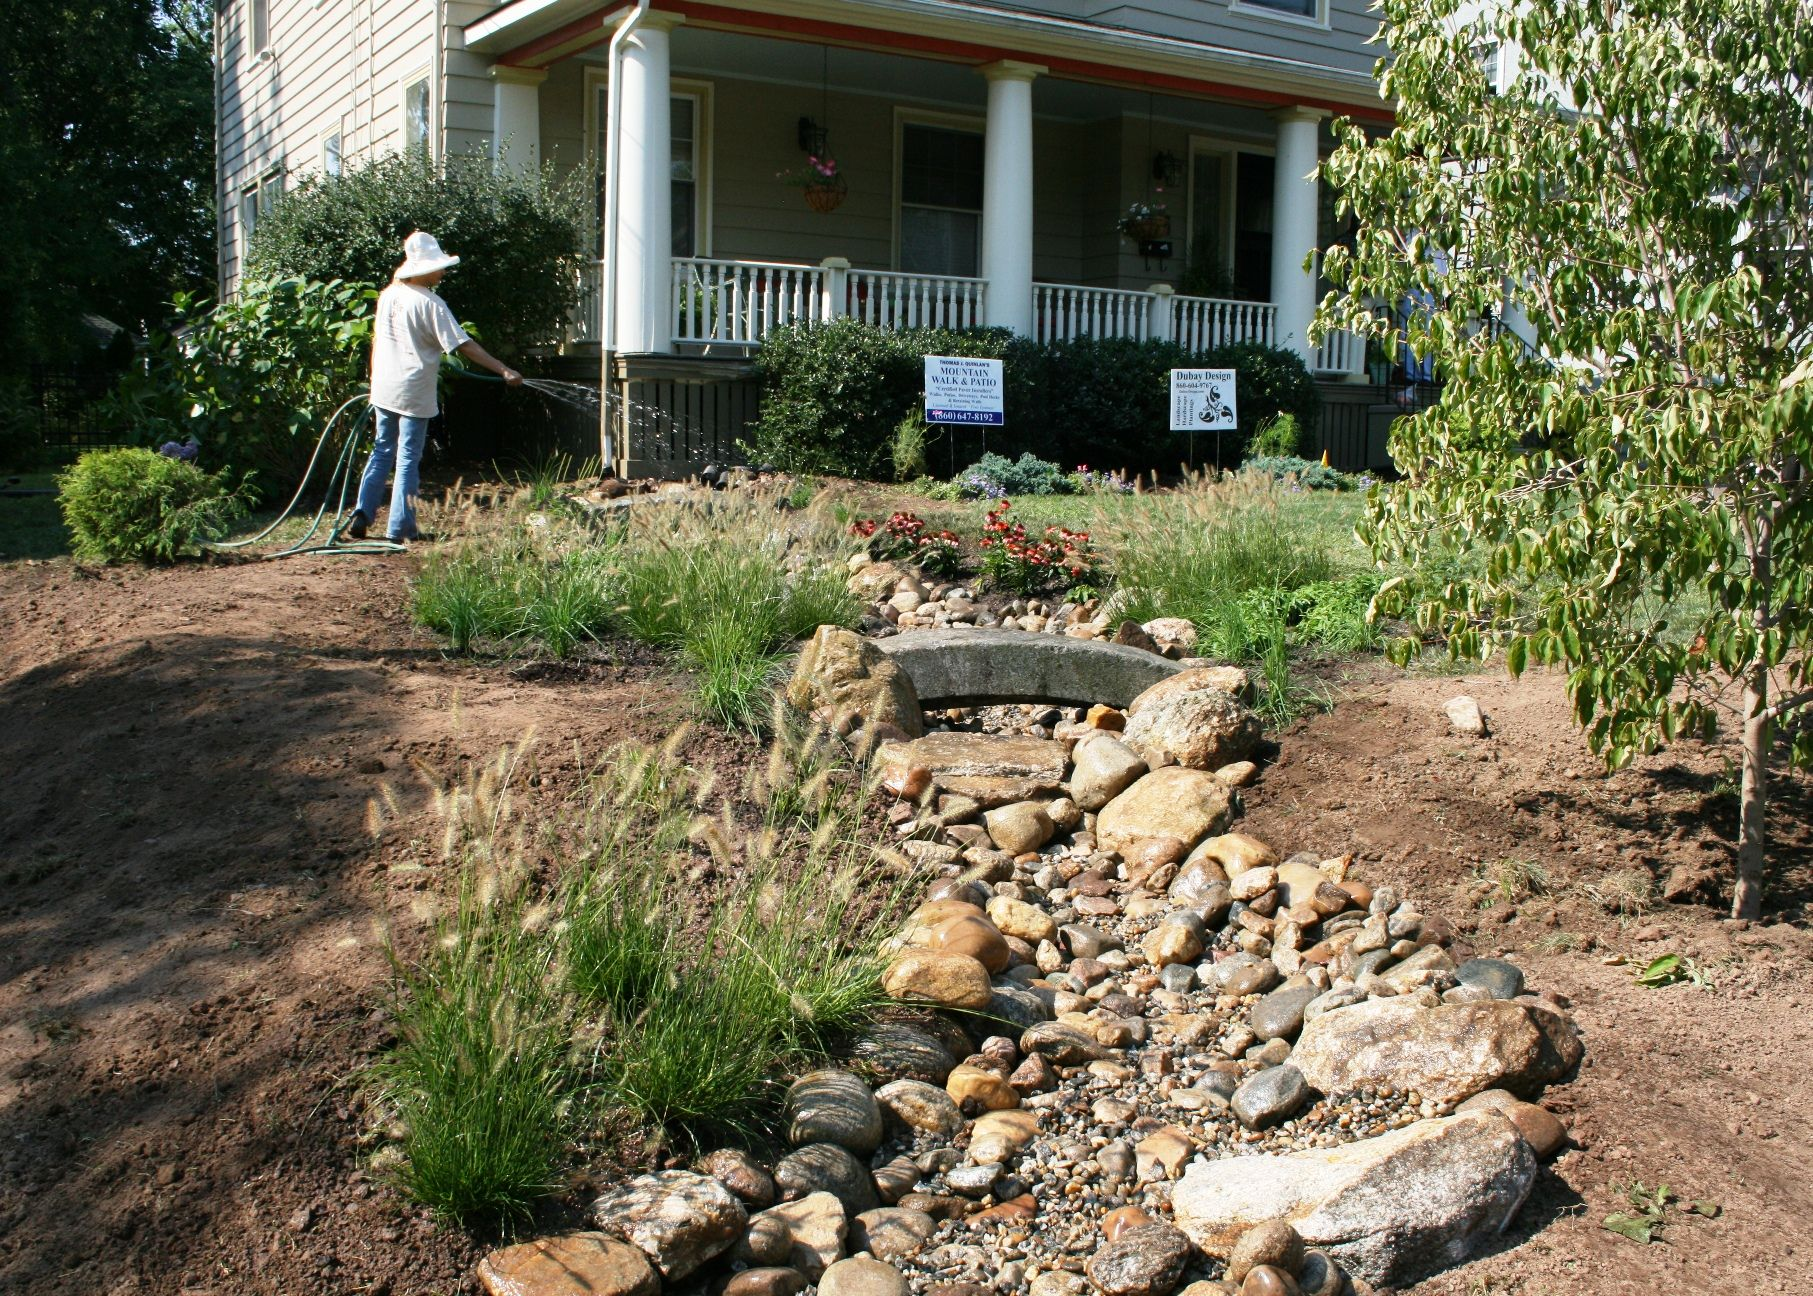 A Gorgeous New Rain Garden/bioswale. Great Idea For The Front Door Gutter